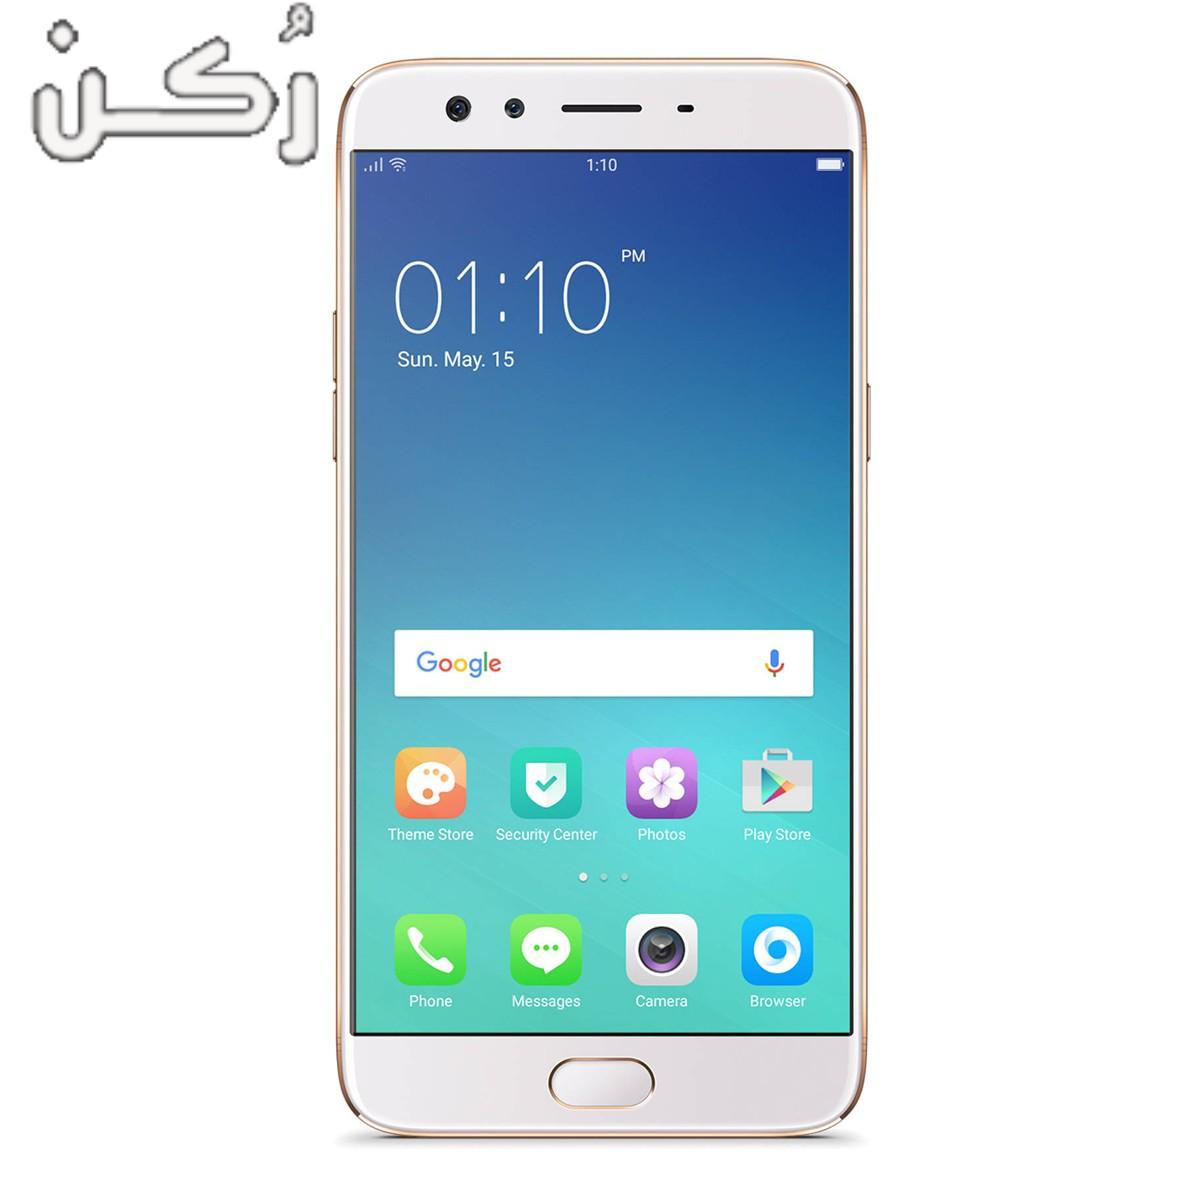 مميزات وعيوب ومواصفات هاتف اوبو f3 2020